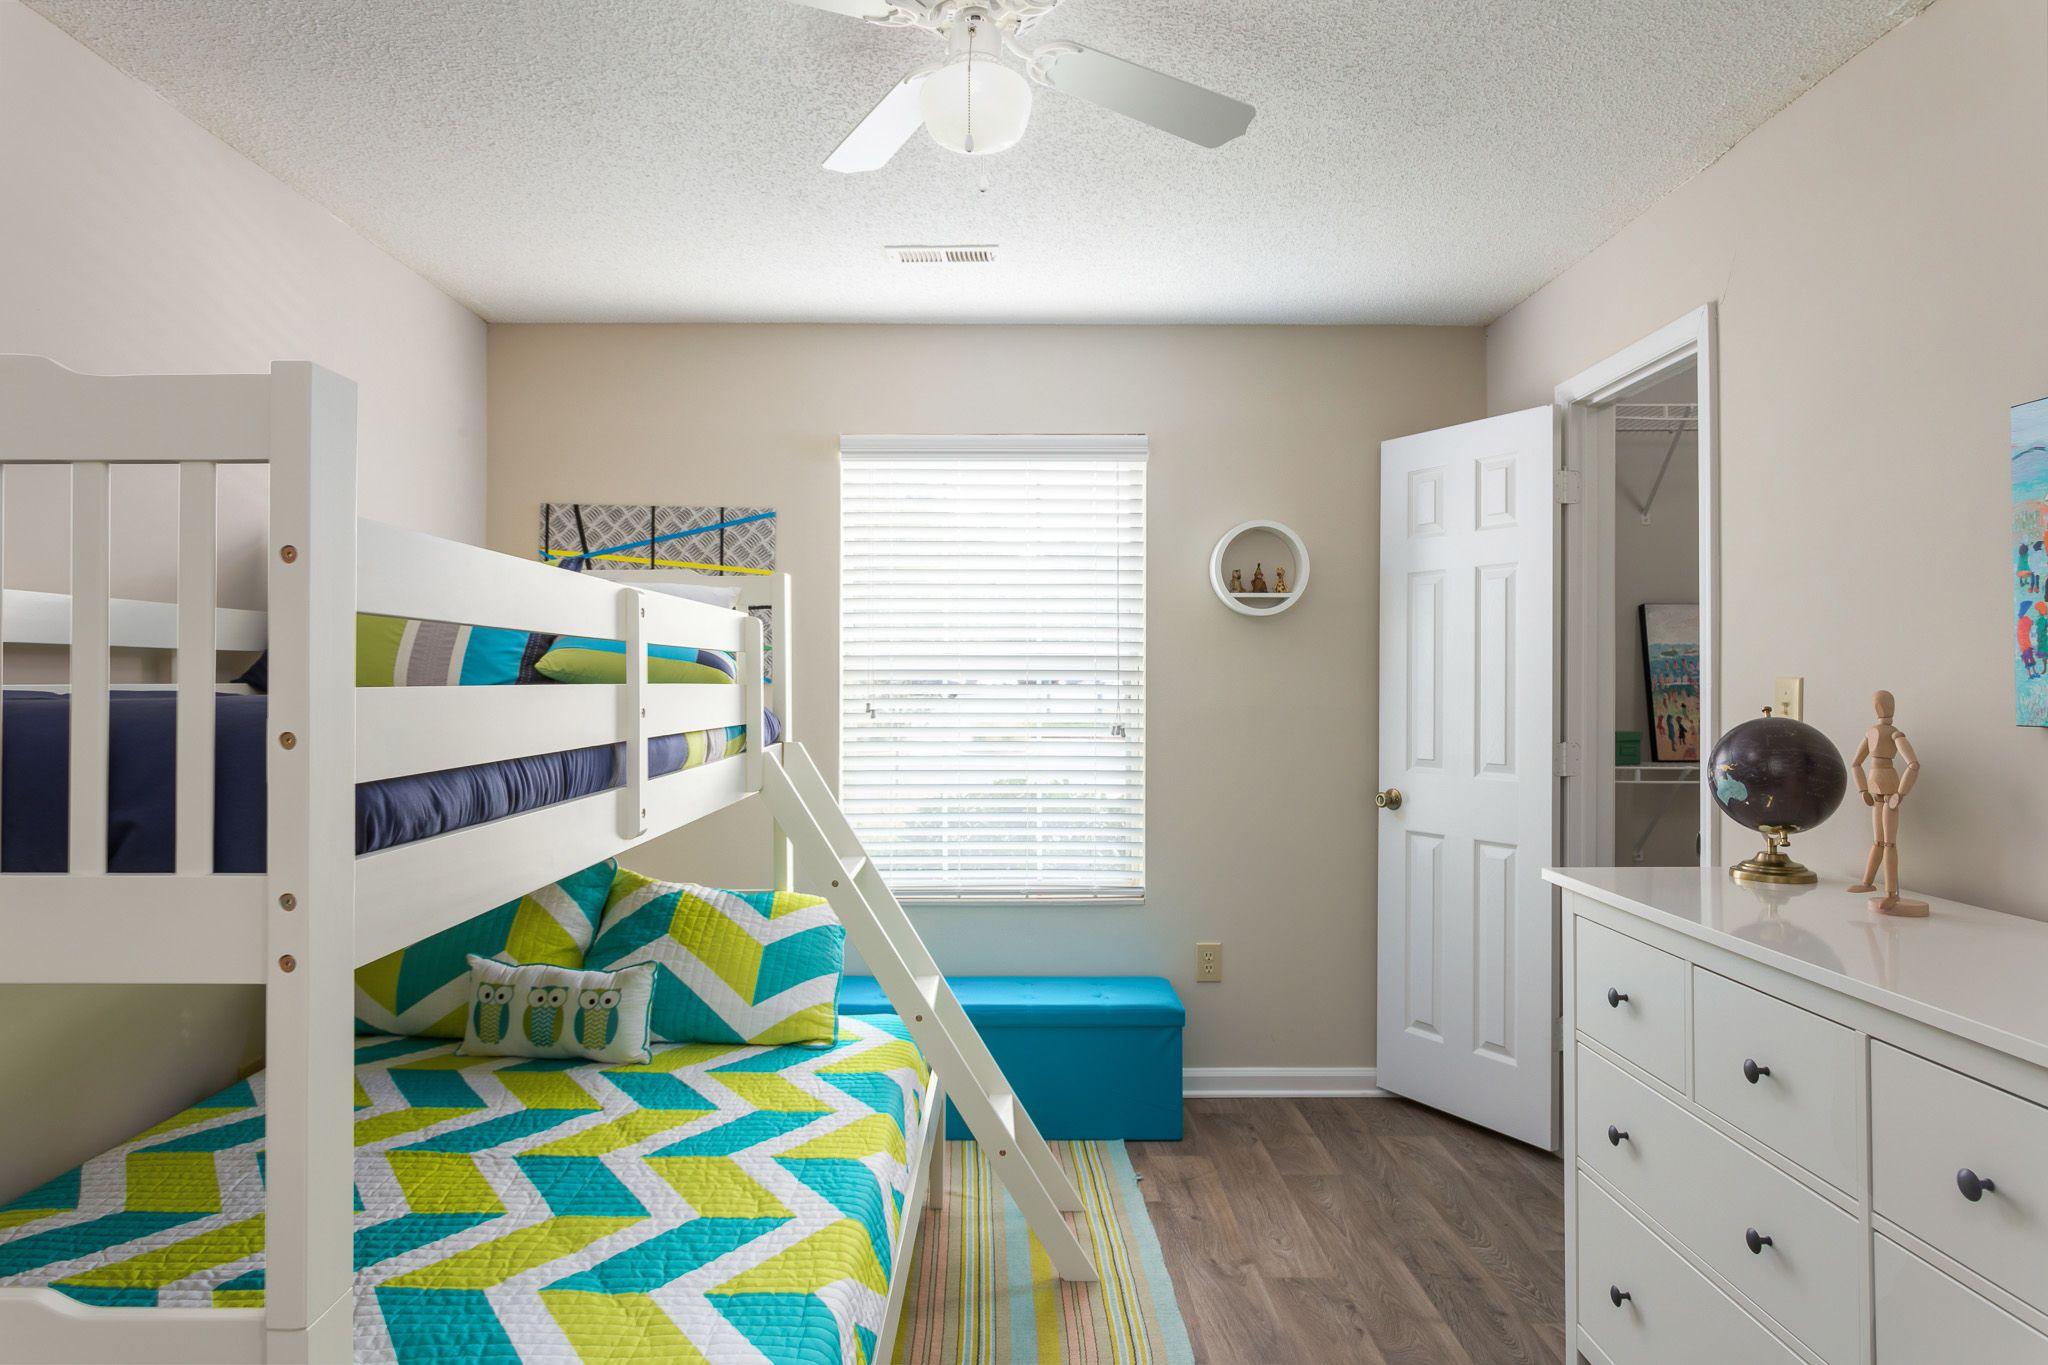 Ashley Oaks Apartments Apartment communities, 2 bedroom